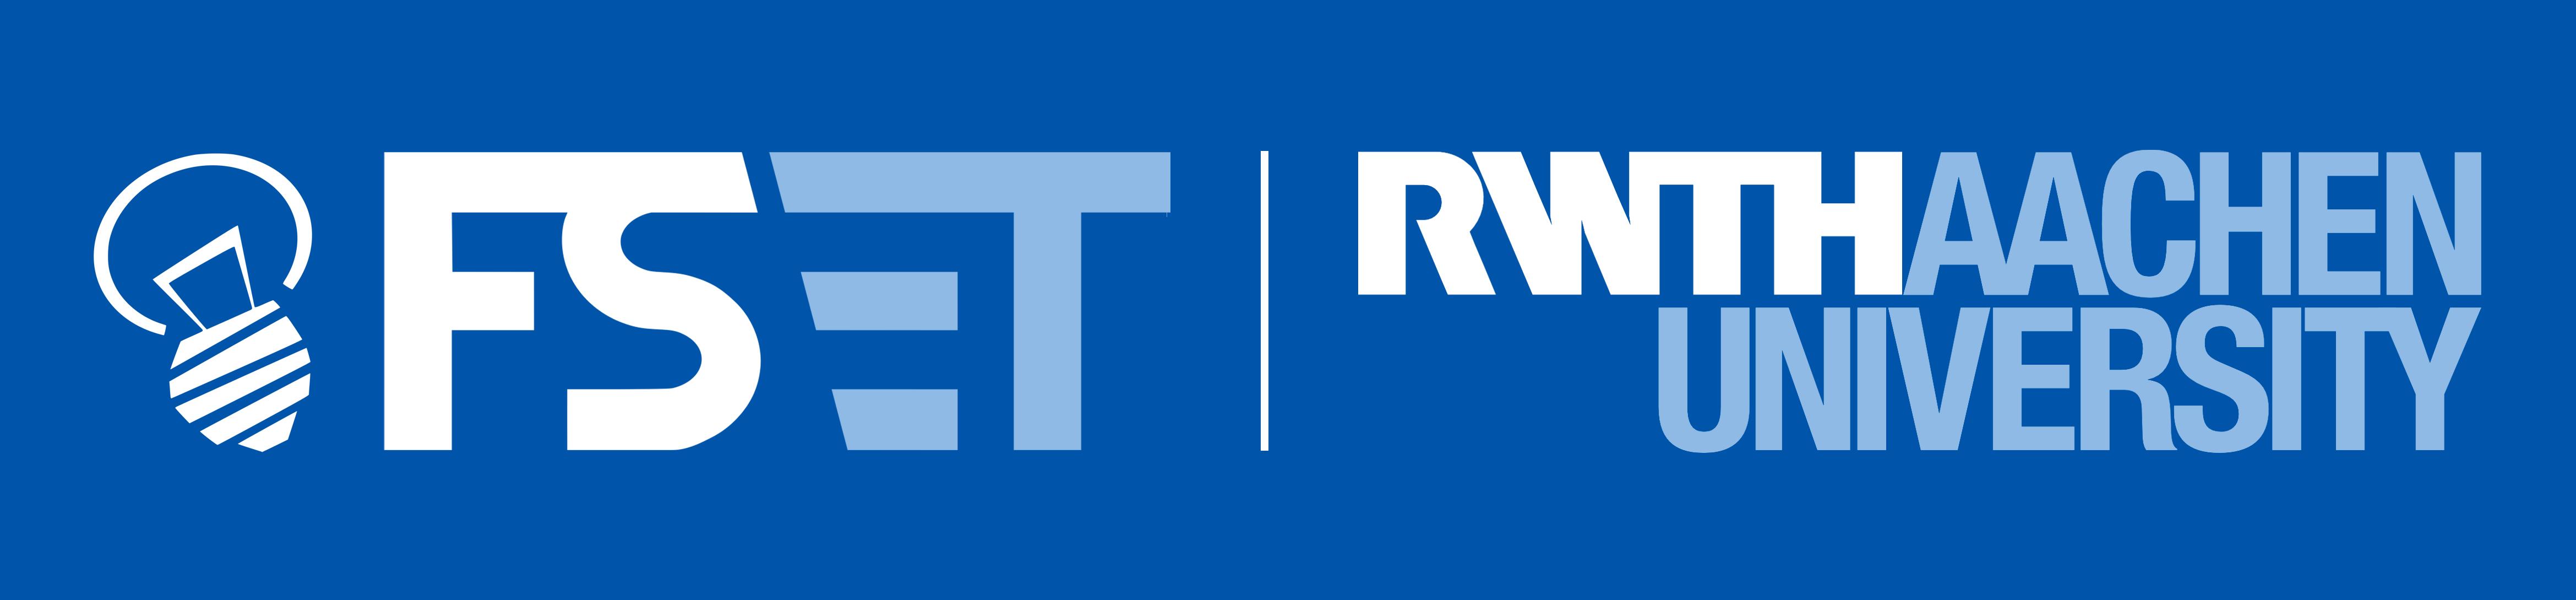 werbung/quelldateien/martin/LIP plakate/FSET + RWTH-Logo 2.png